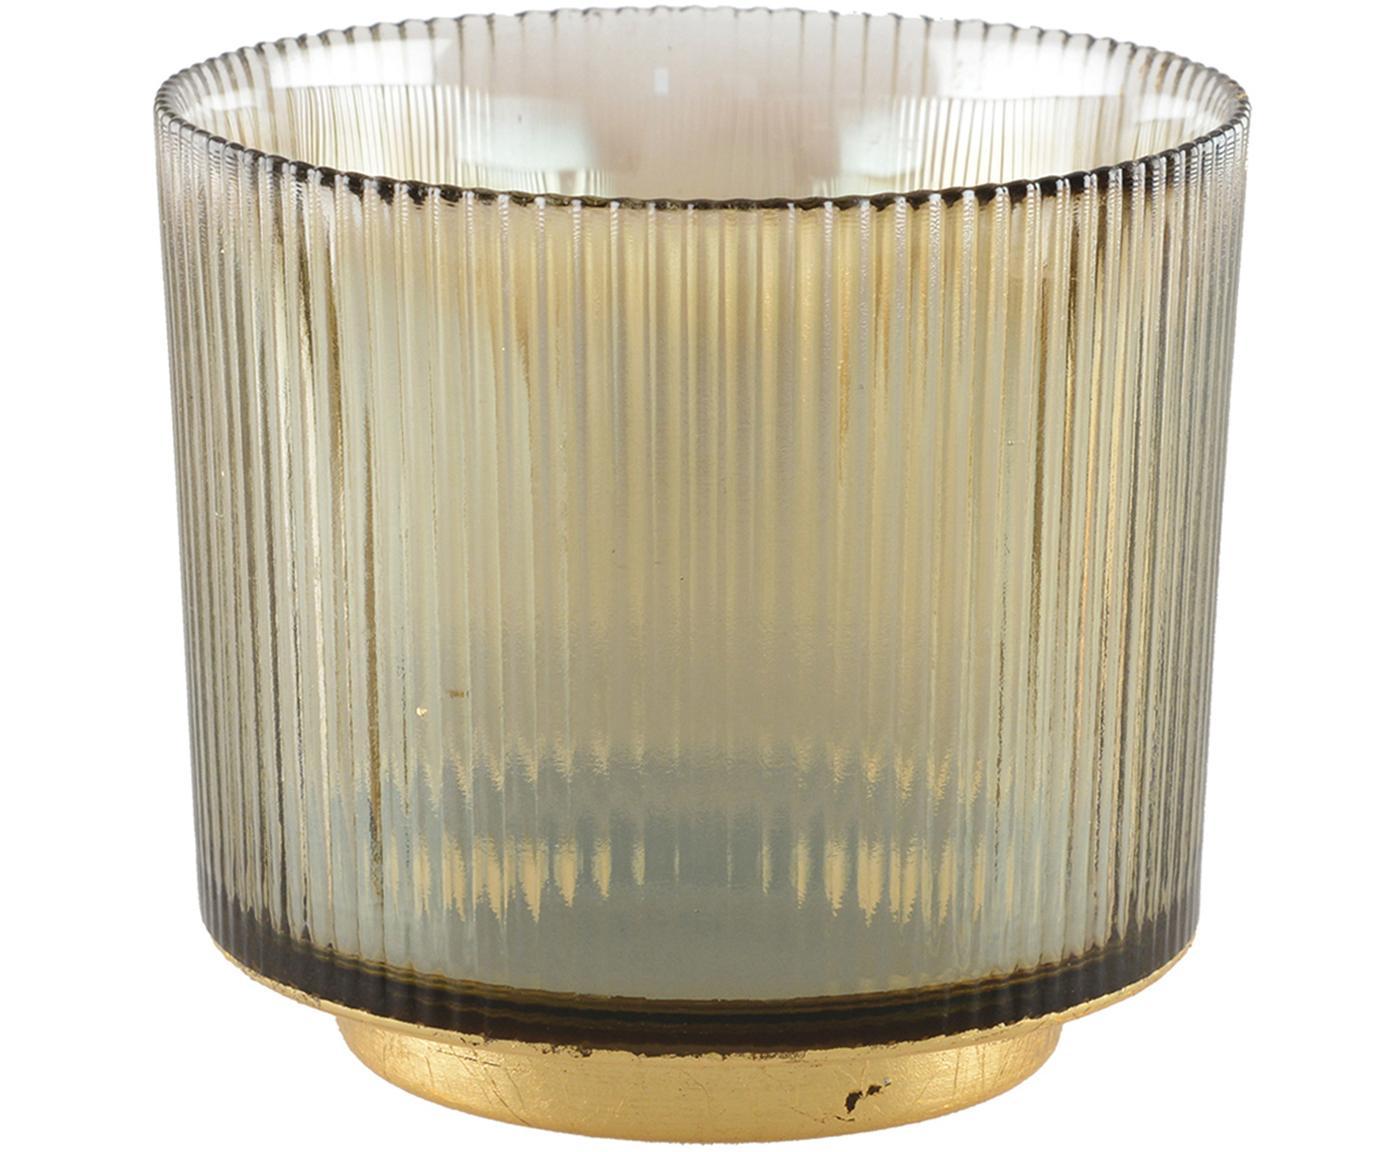 Portalumini Luster, Vetro, metallo, Brunastro trasparente, dorato, Ø 10 cm